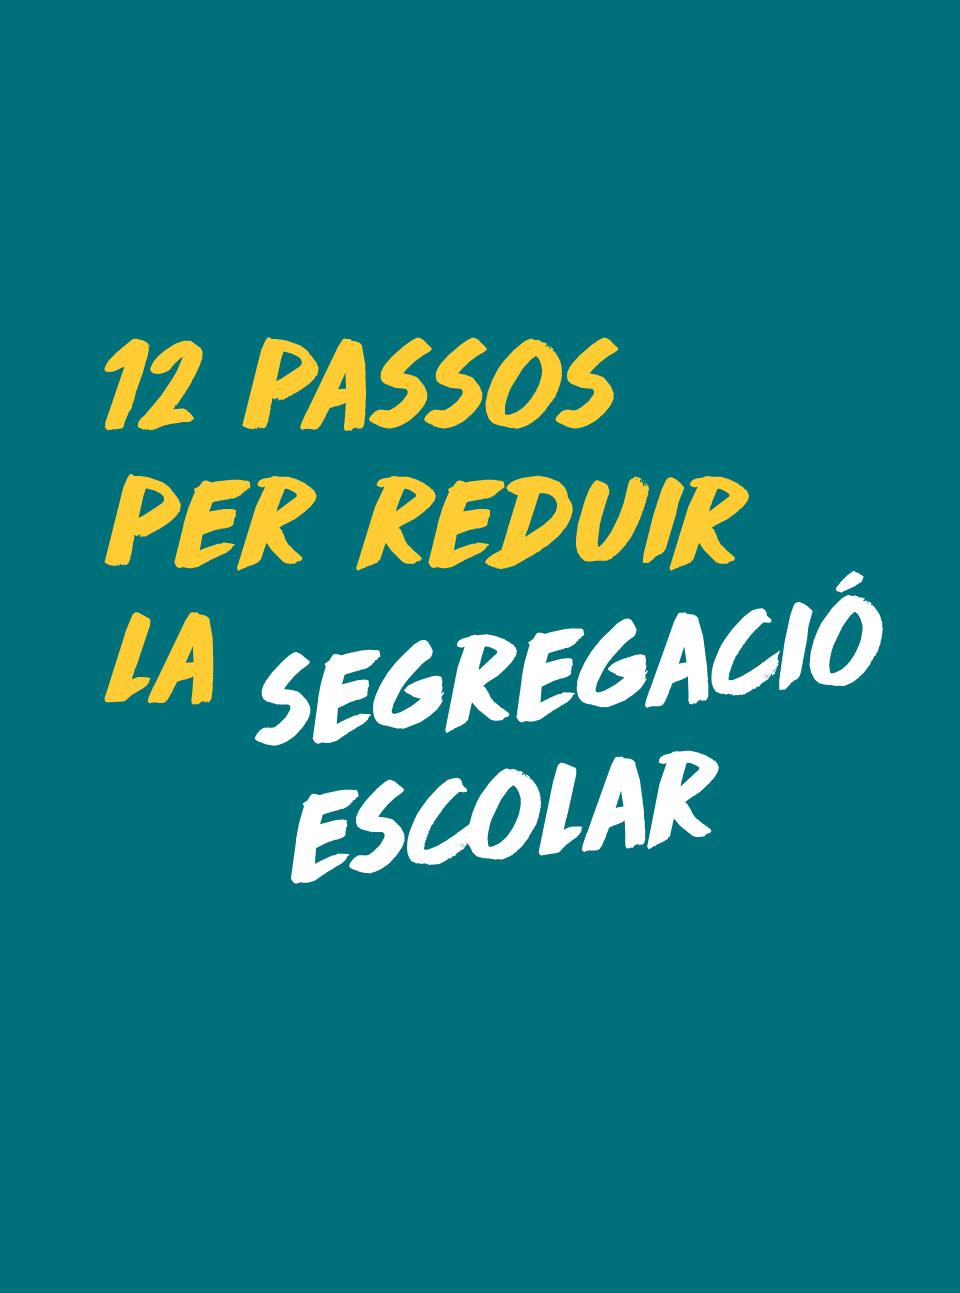 1xx-12passos.jpg